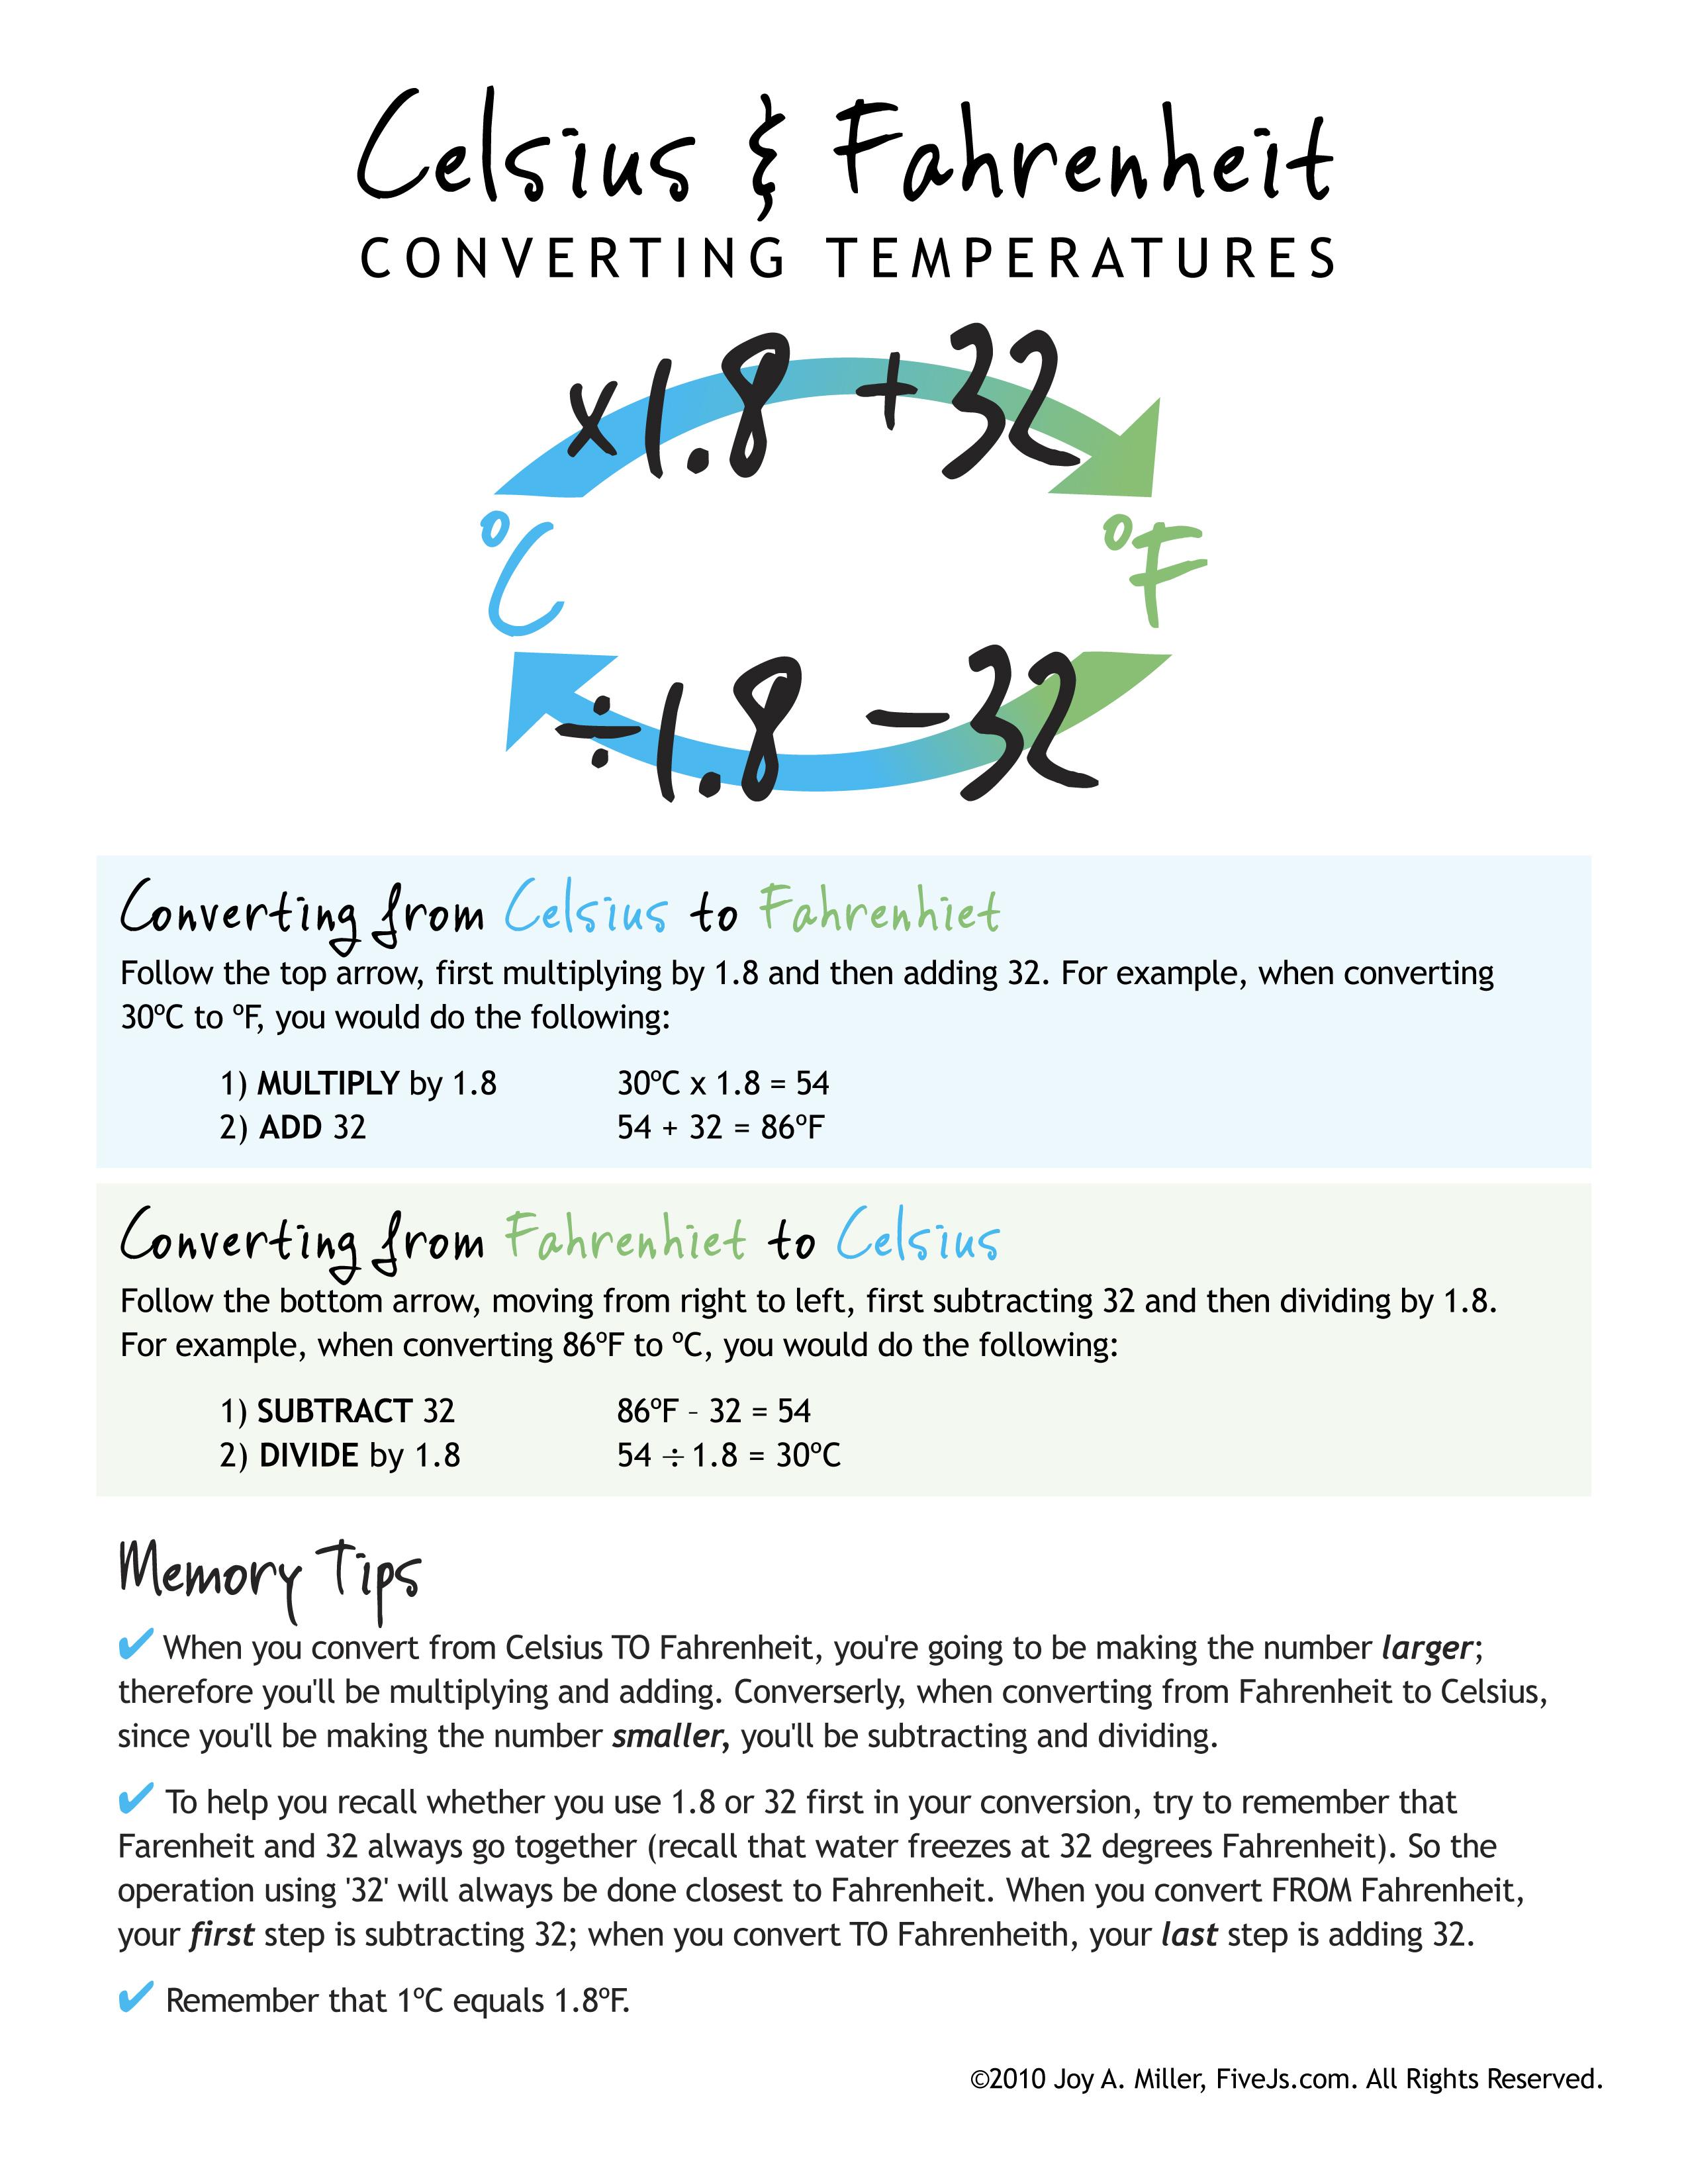 Free Celsius & Fahrenheit conversion chart. Great memory tool! #homeschool